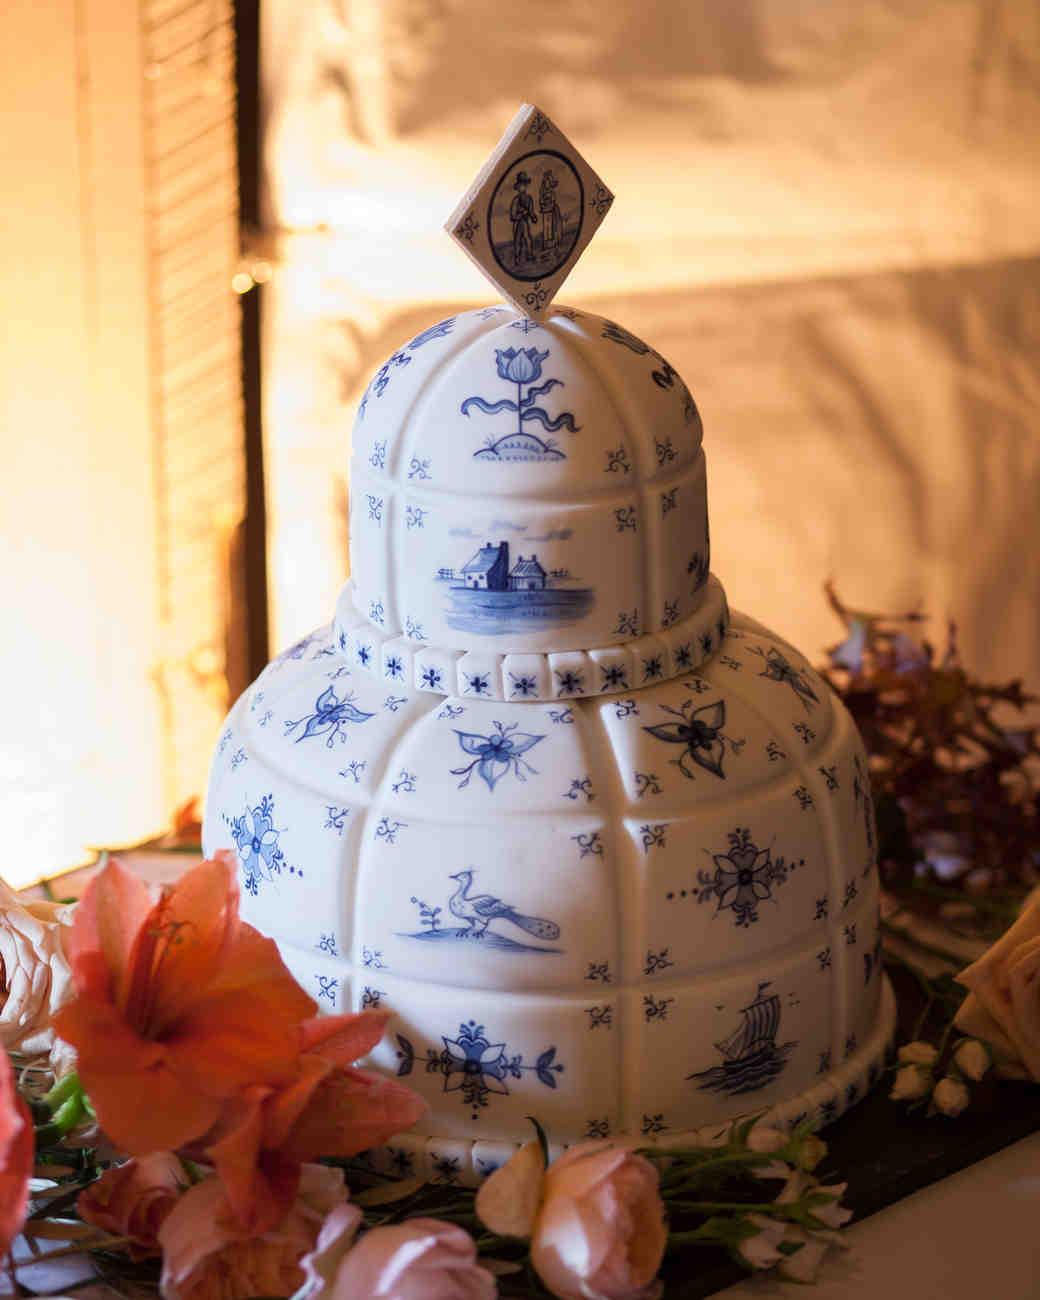 hanna-jimm-wedding-cake-084-s111413-0814.jpg